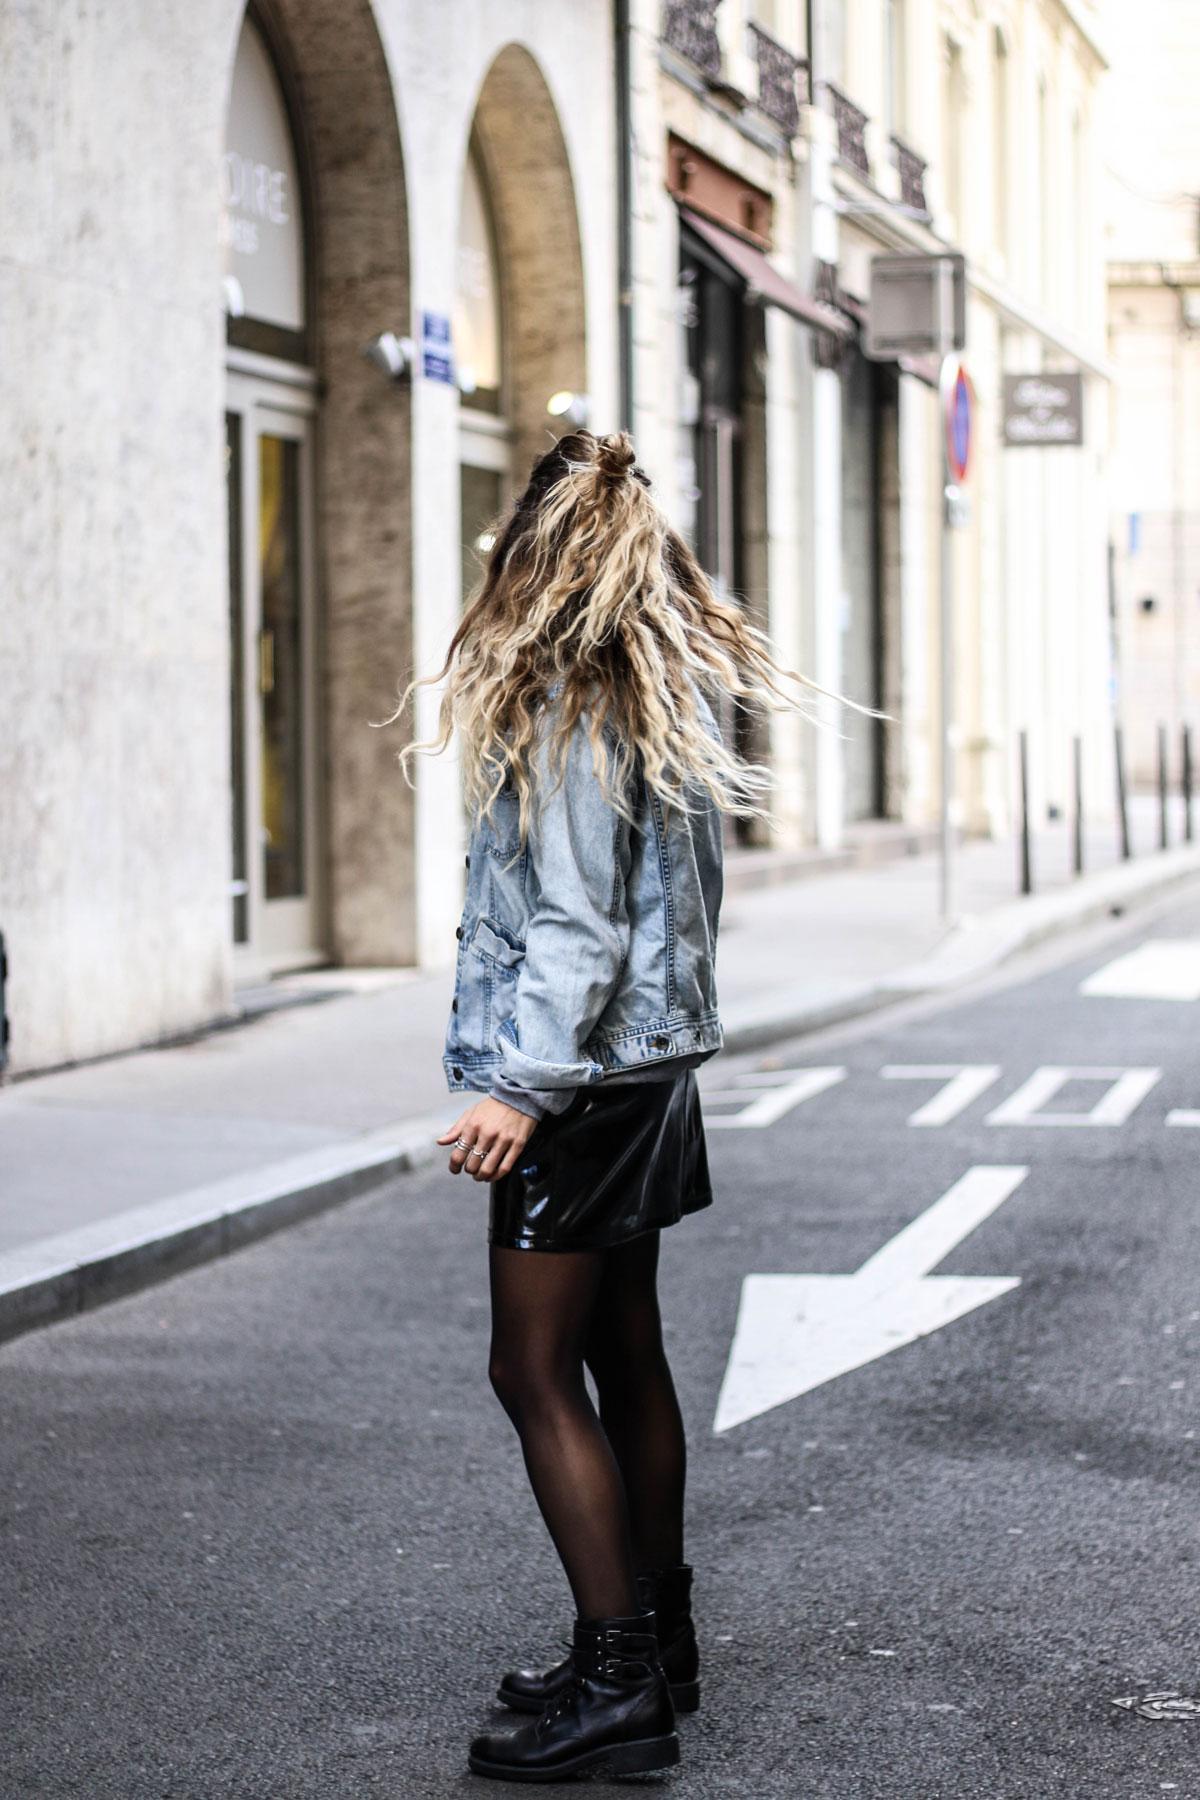 Jupe Vinyle Marie And Mood Blog Mode Et Lifestyle Lyon